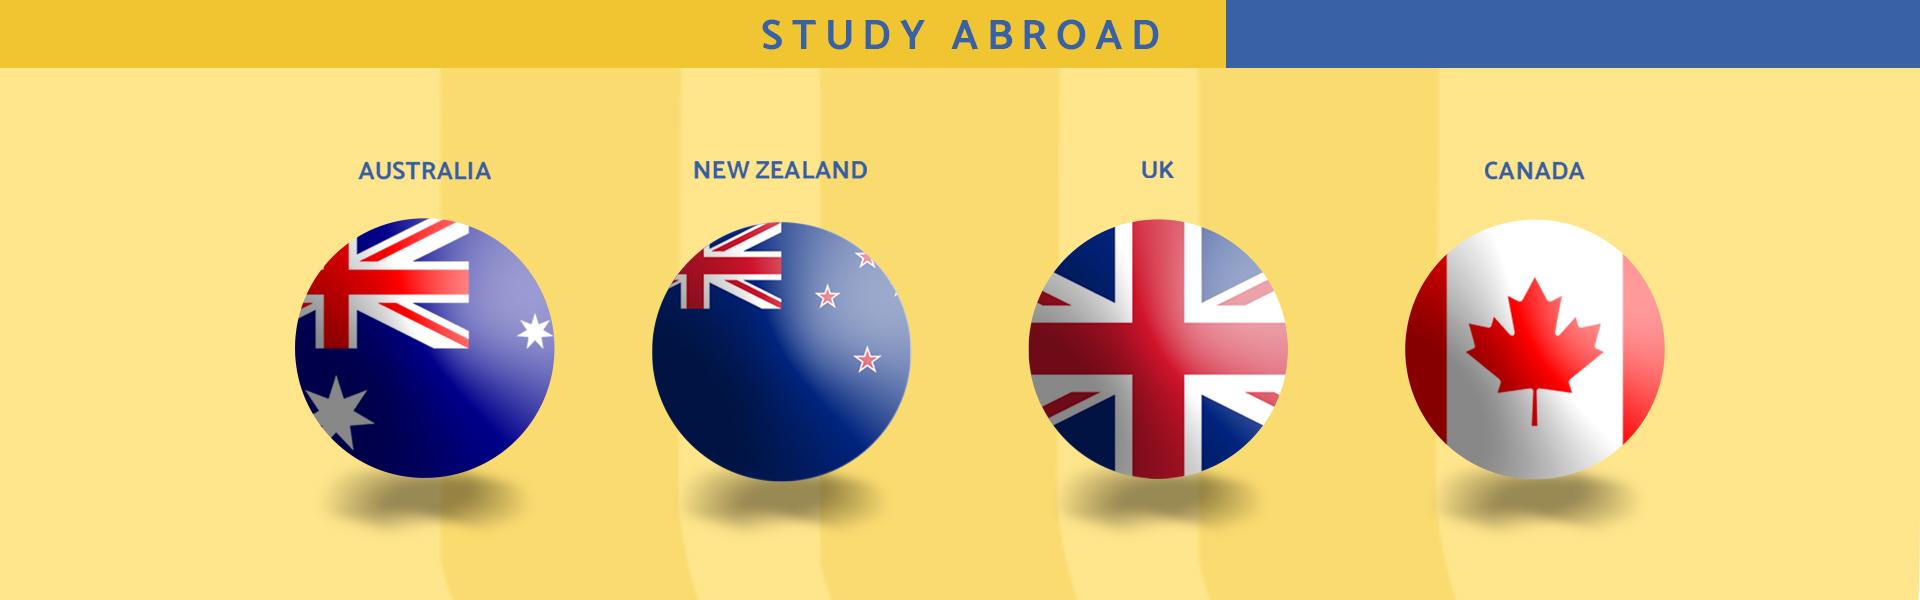 slide-study-abroad1